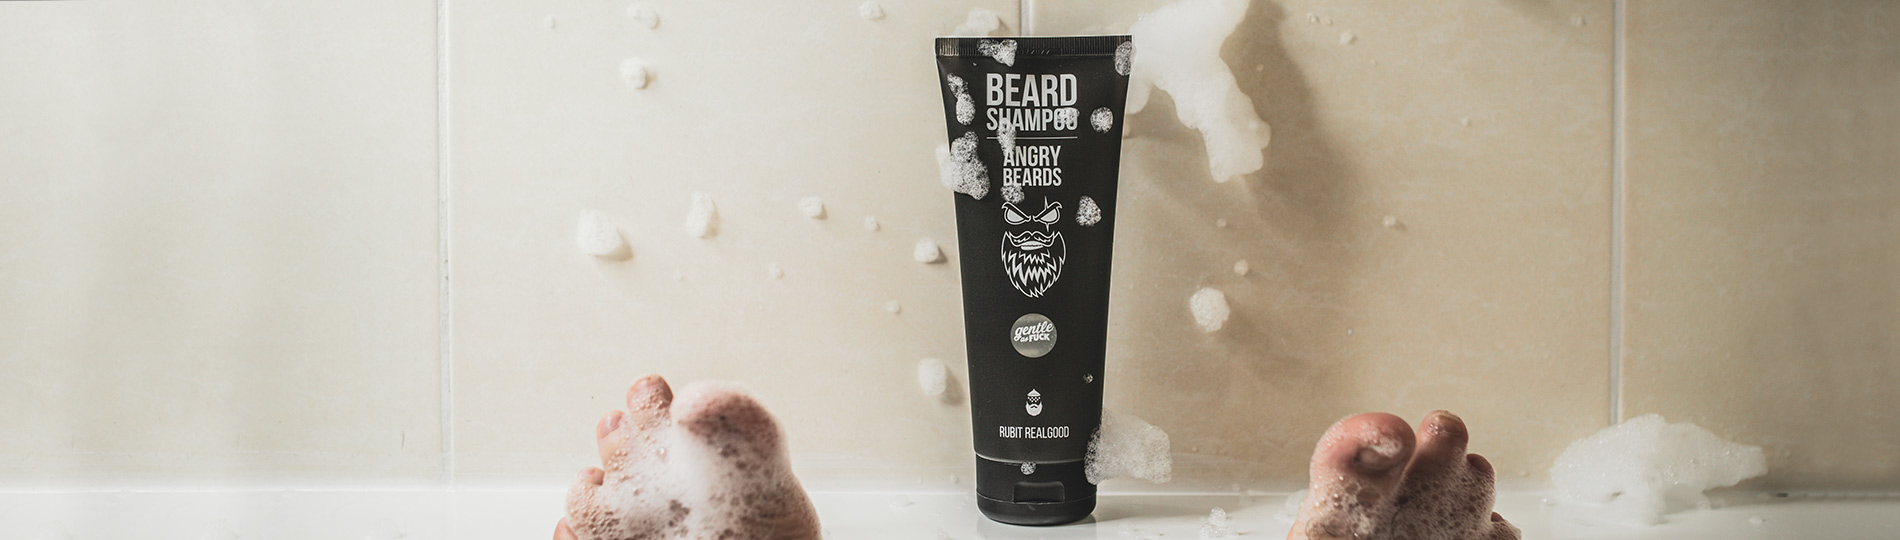 AB_BeardShampoo